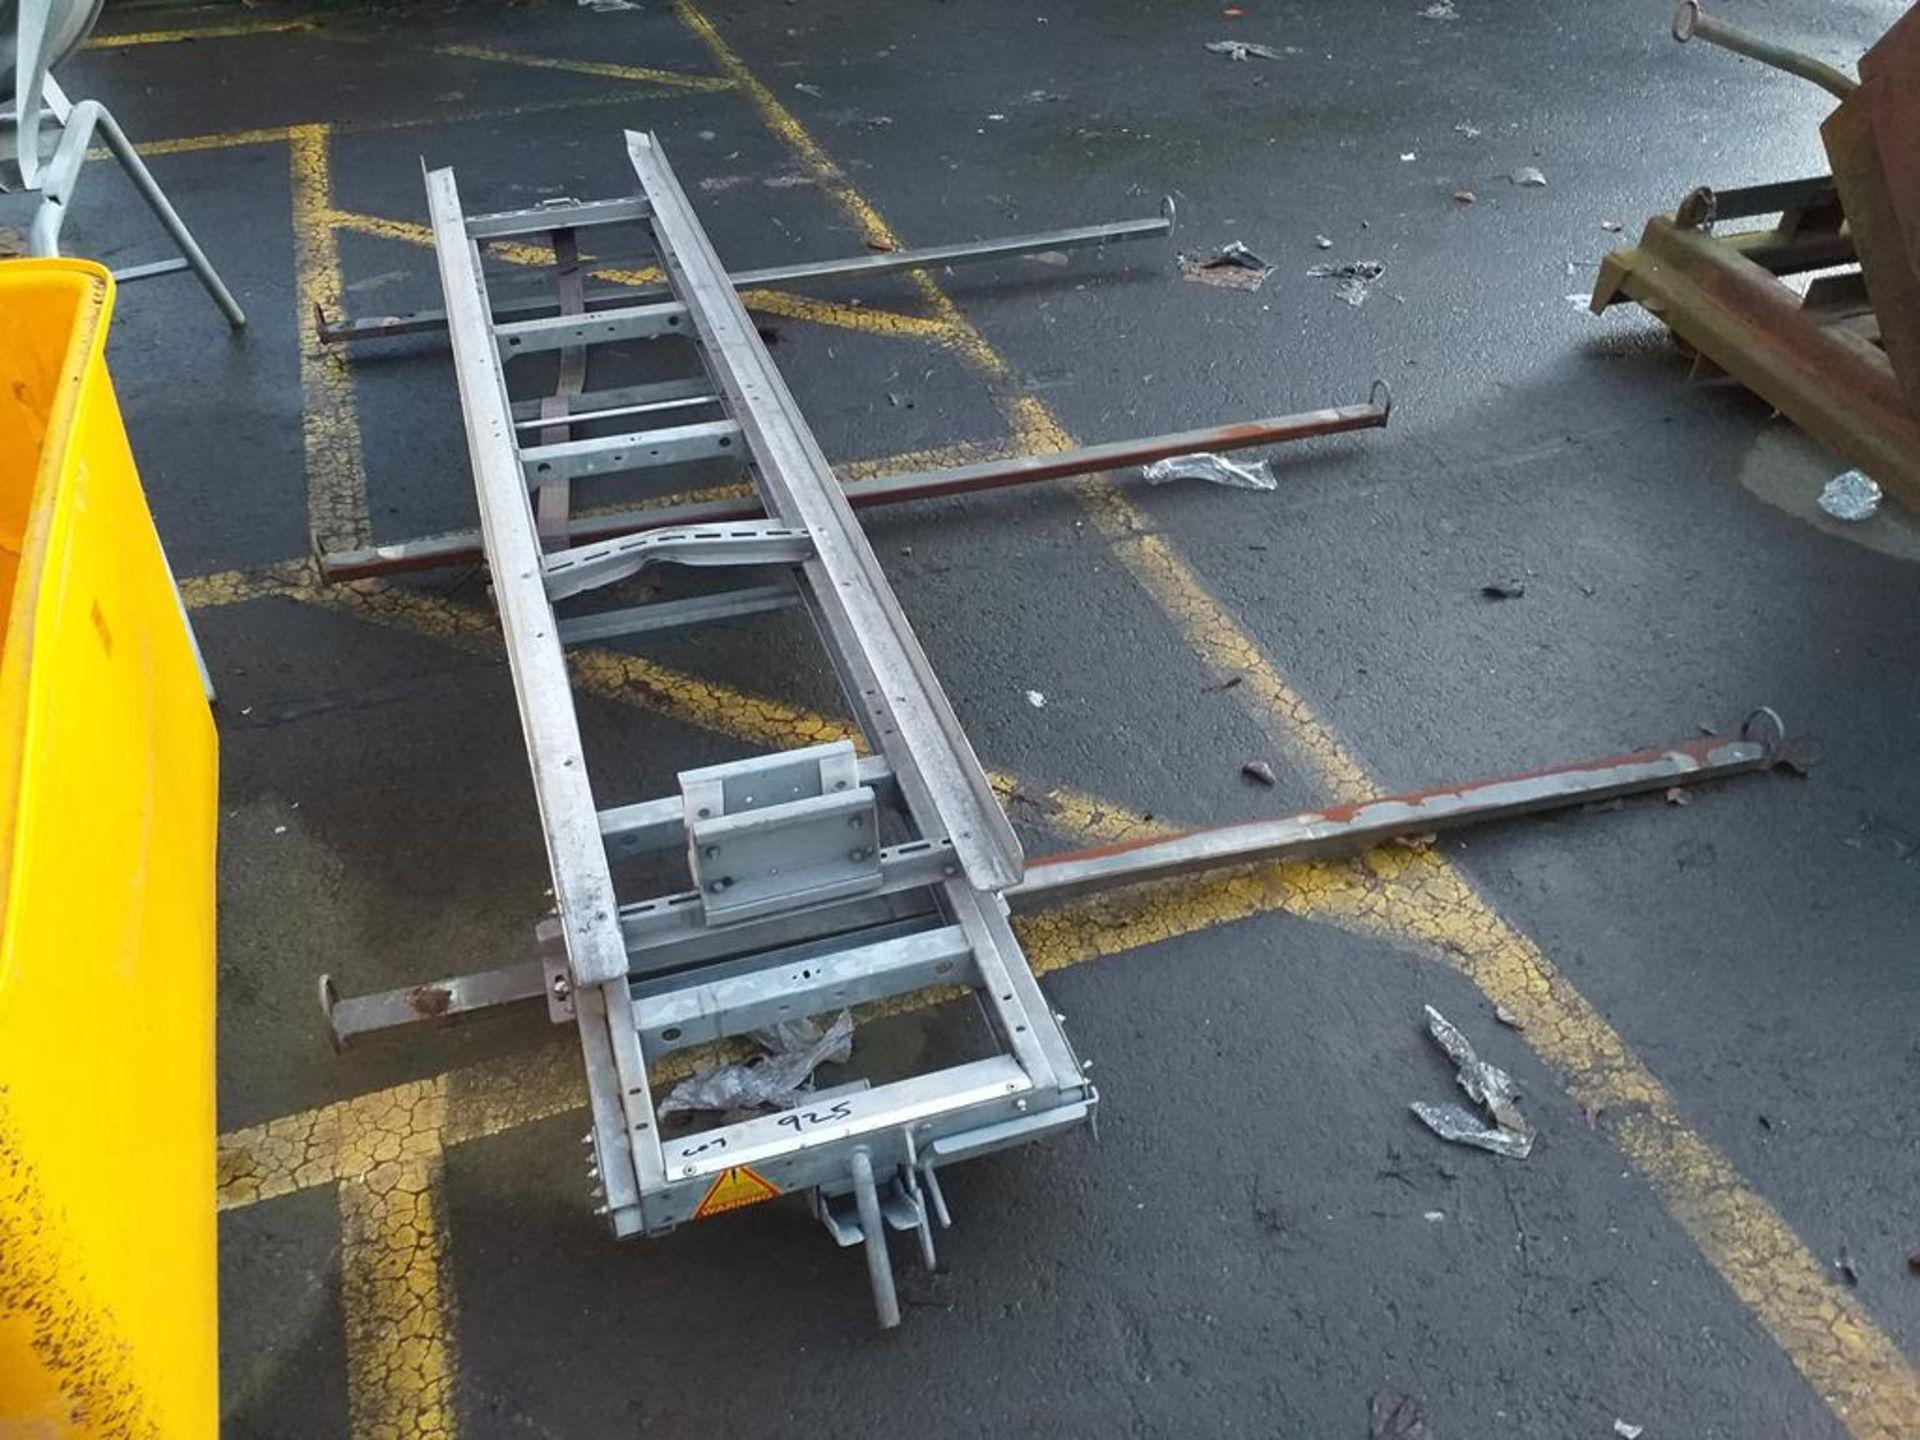 Lot 925 - Van Roof Rack and Ladder Rack System